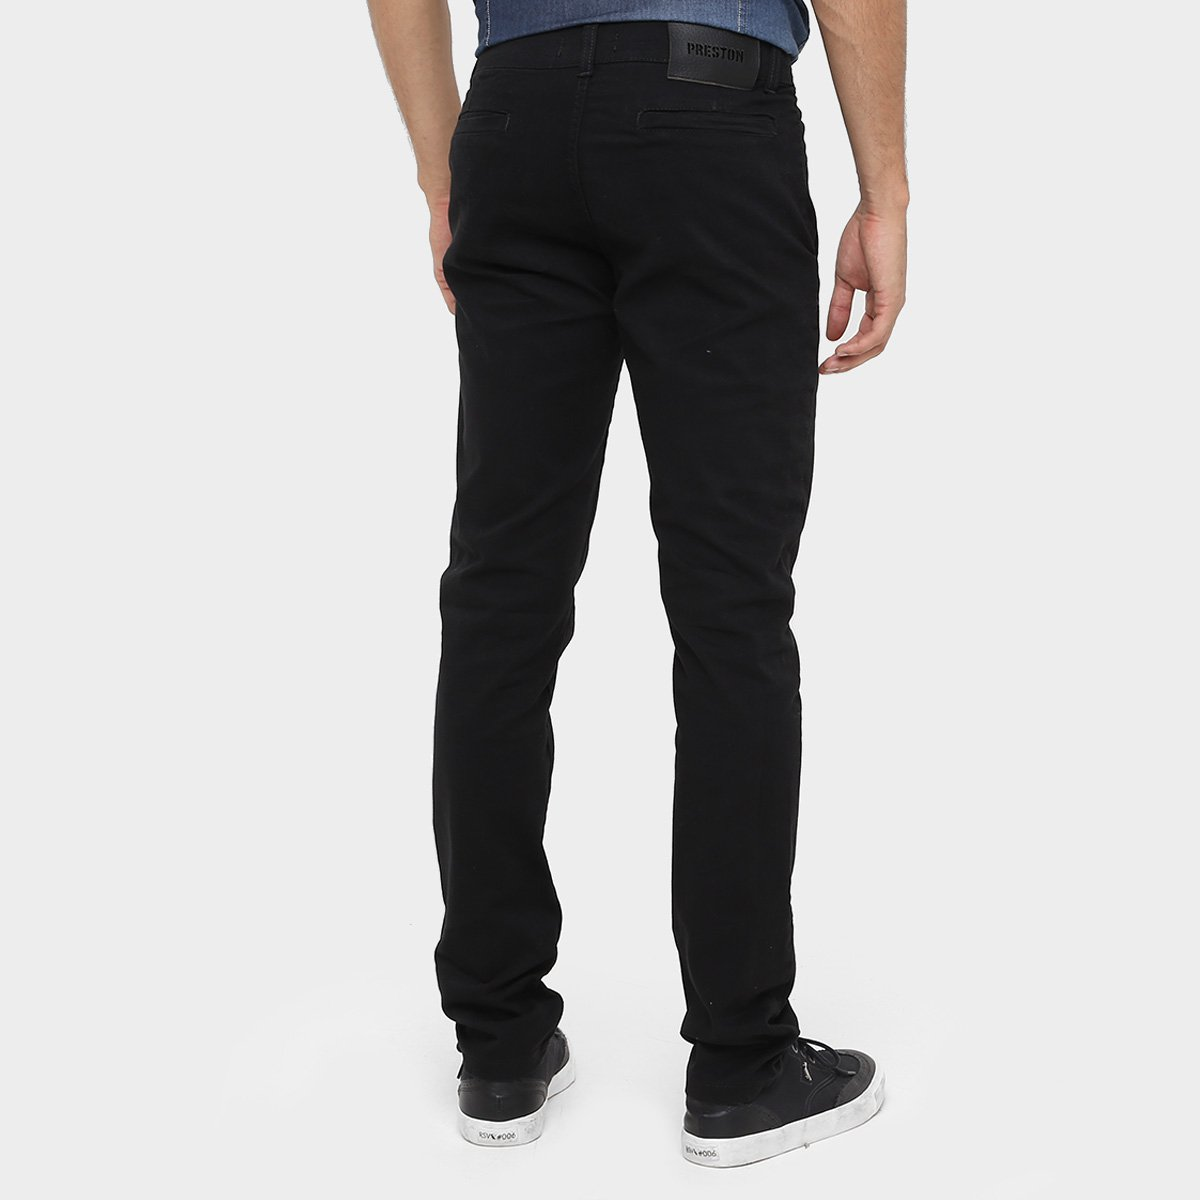 Calça Skinny Preston Color Bolso Faca Masculina - Compre Agora ... 886f5398431